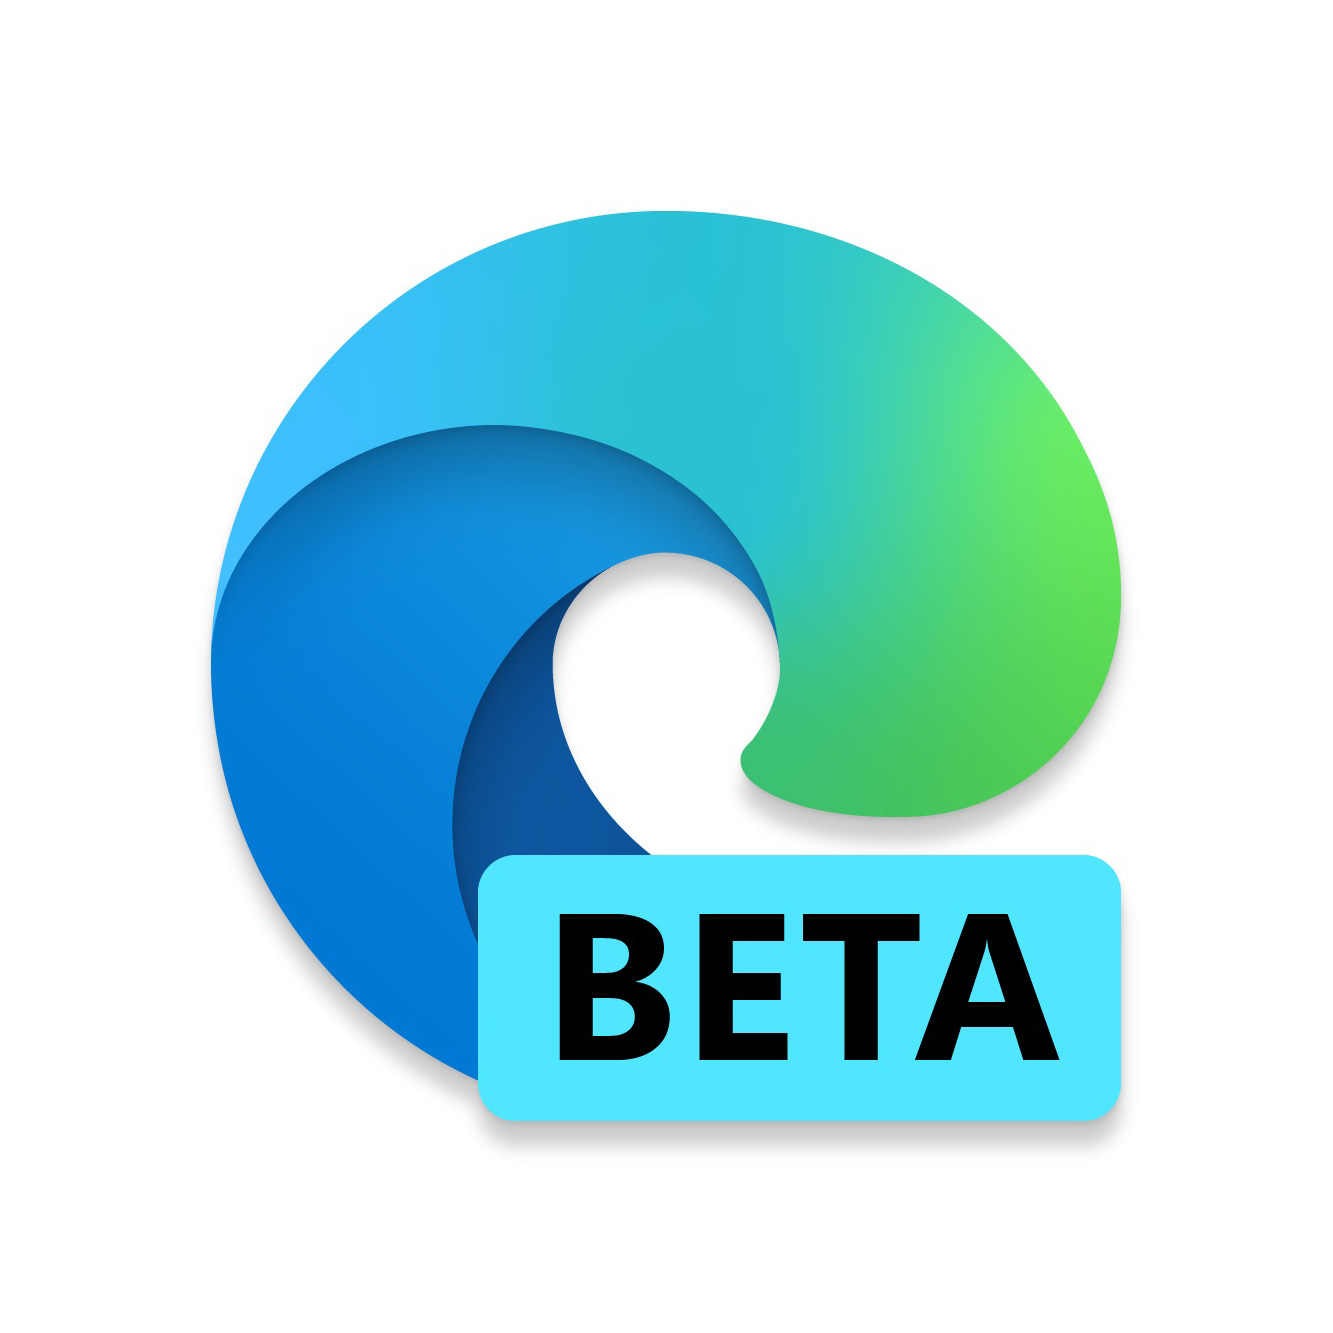 New Logo for Microsoft Edge